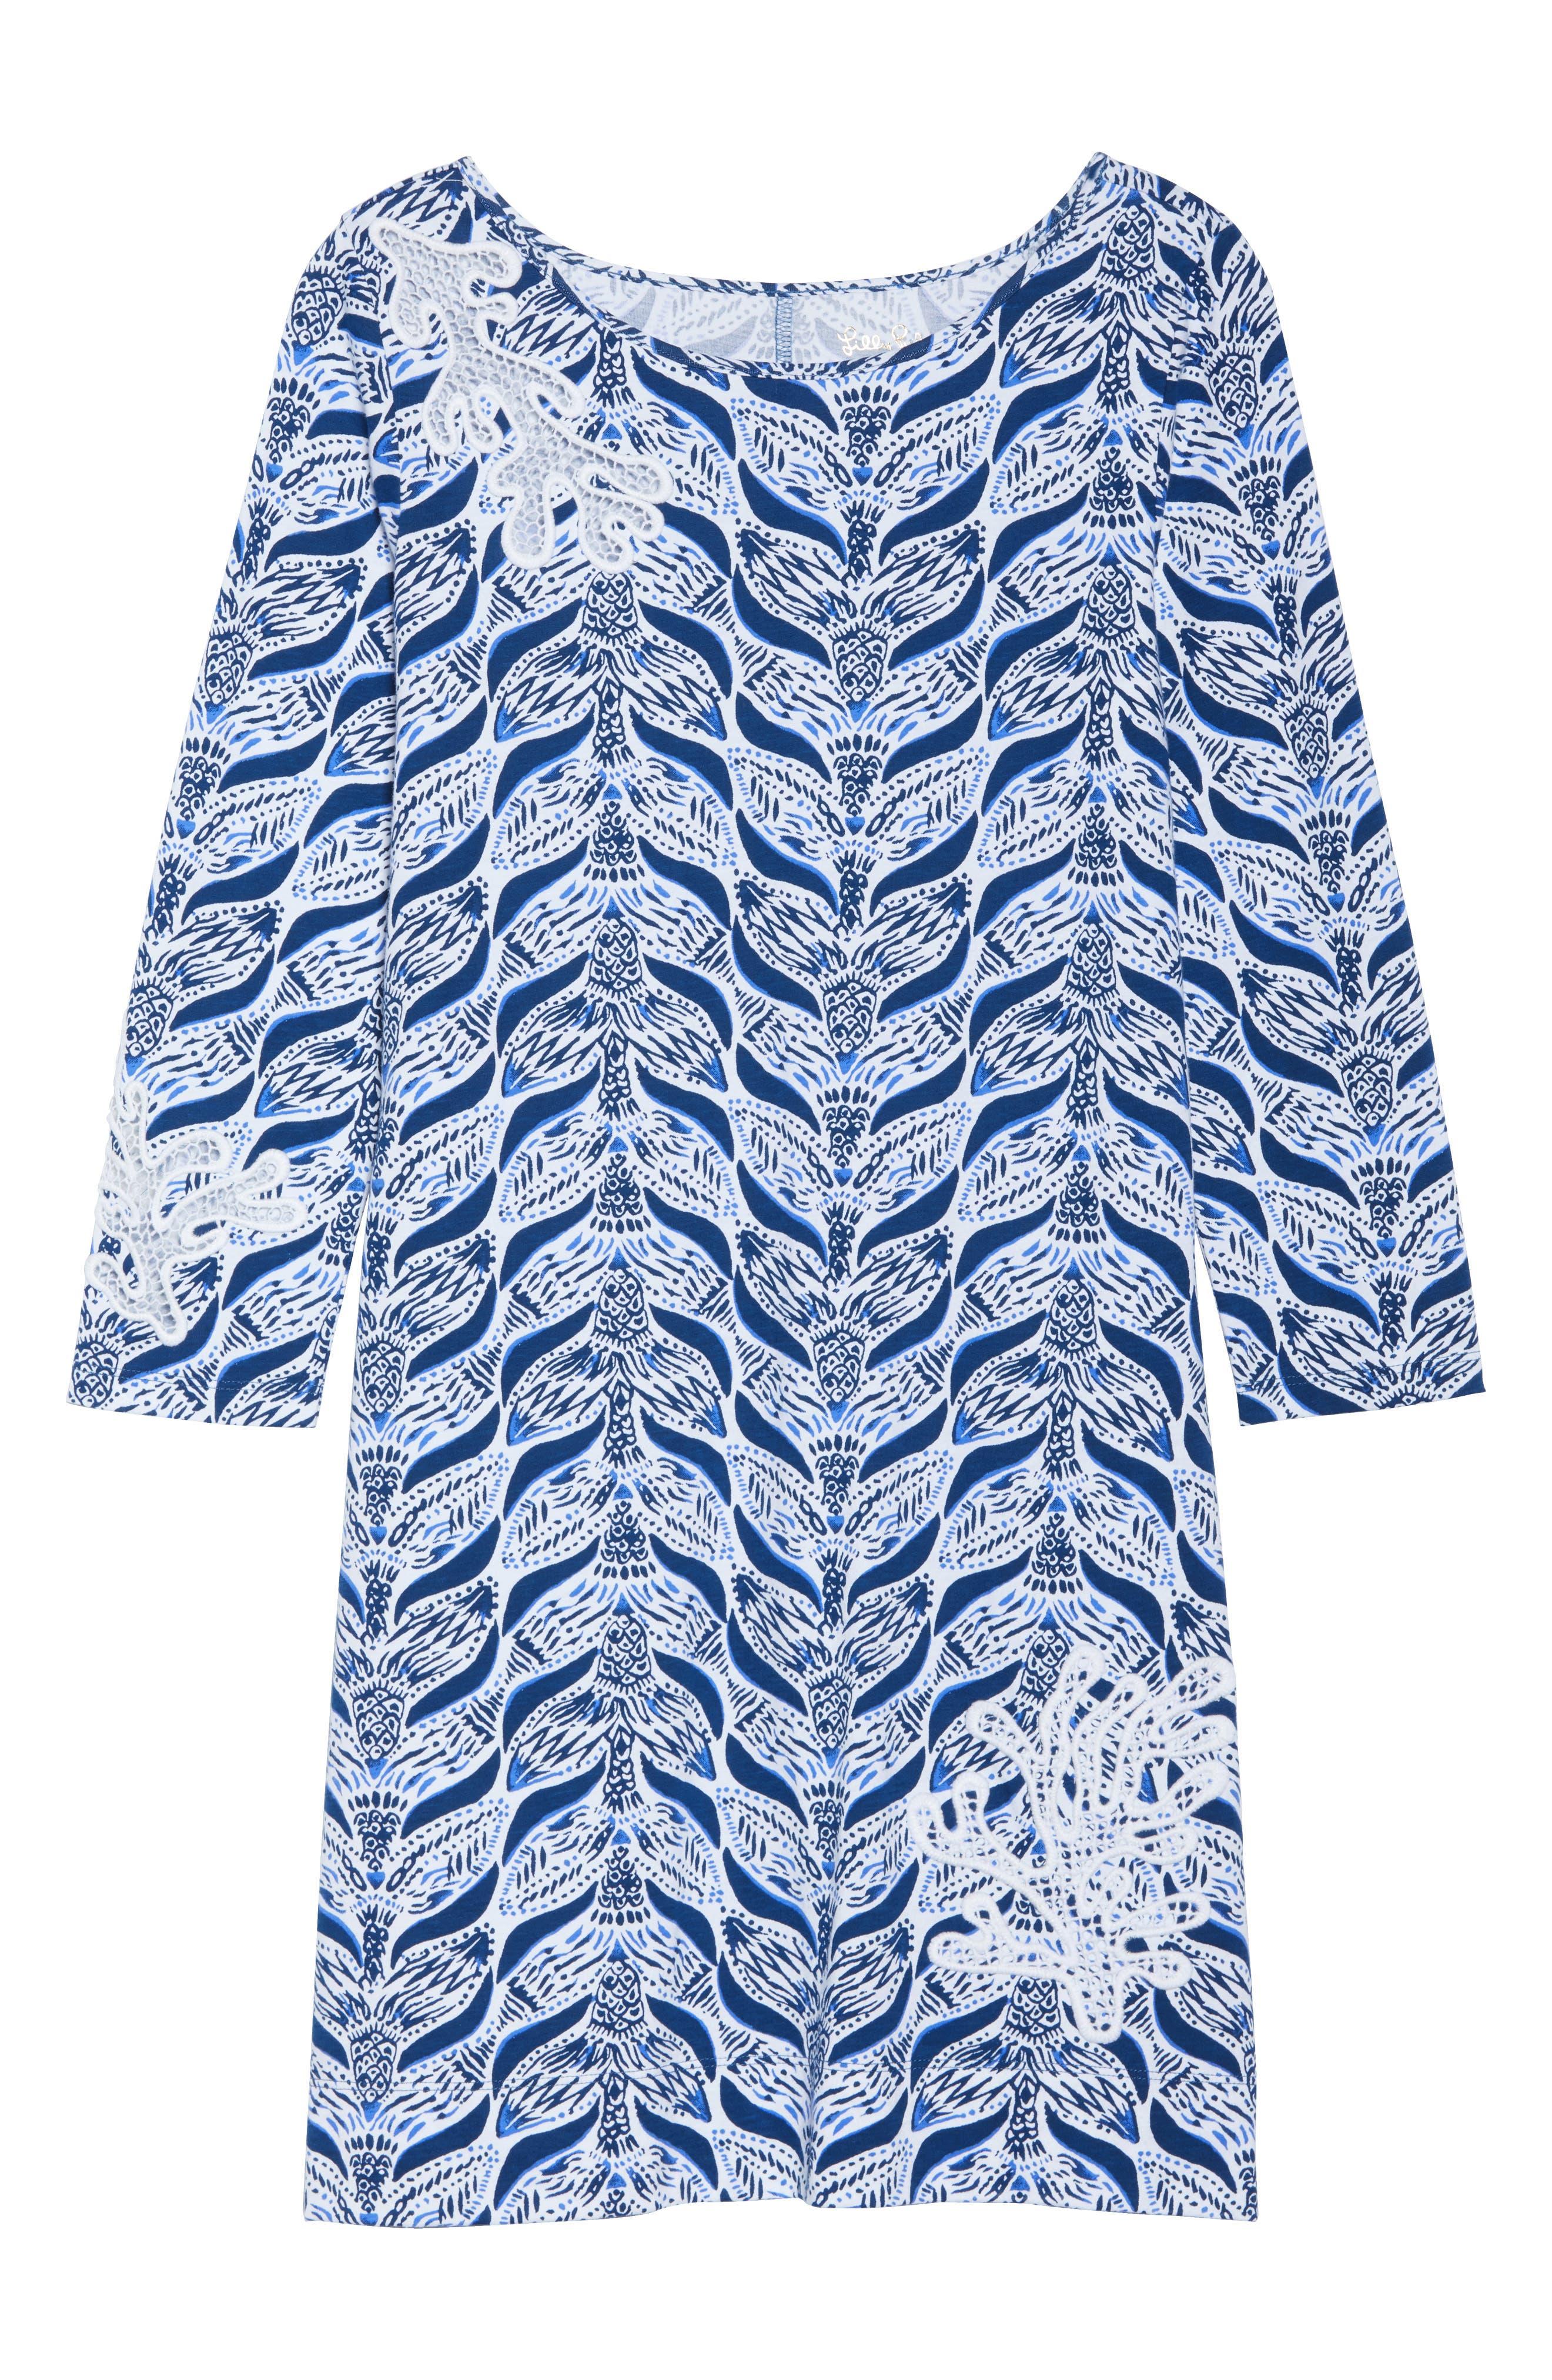 Marlowe T-Shirt Dress,                             Alternate thumbnail 6, color,                             Resort White A Mermaids Tail